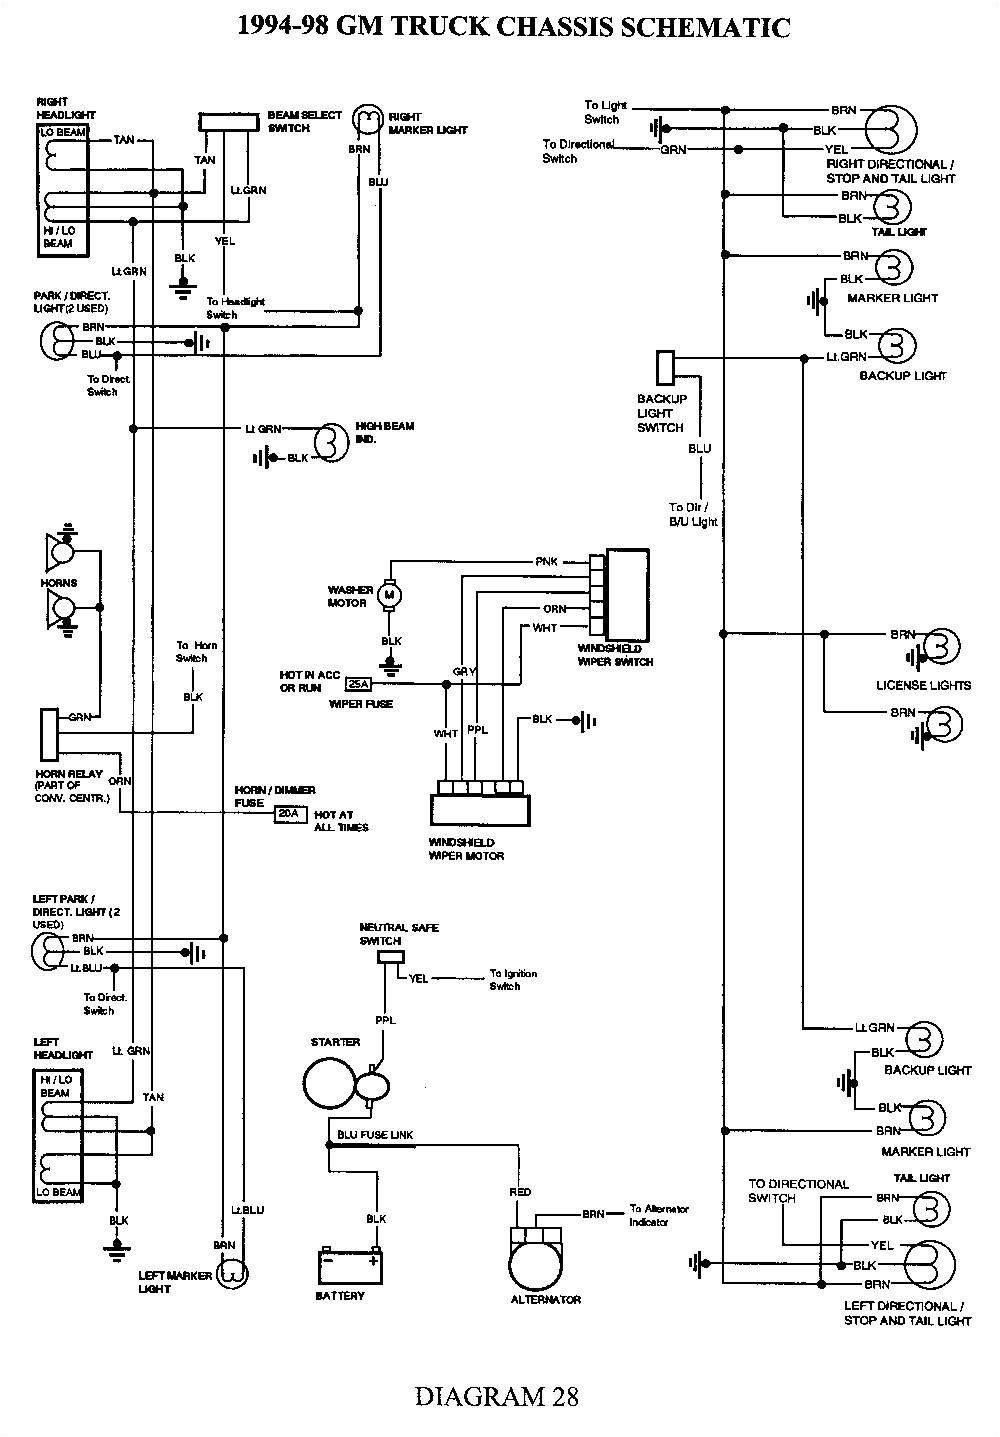 2005 Chevy Silverado Tail Light Wiring Diagram Chevy Tail Light Wiring Diagram Free Picture Wiring Diagram Name